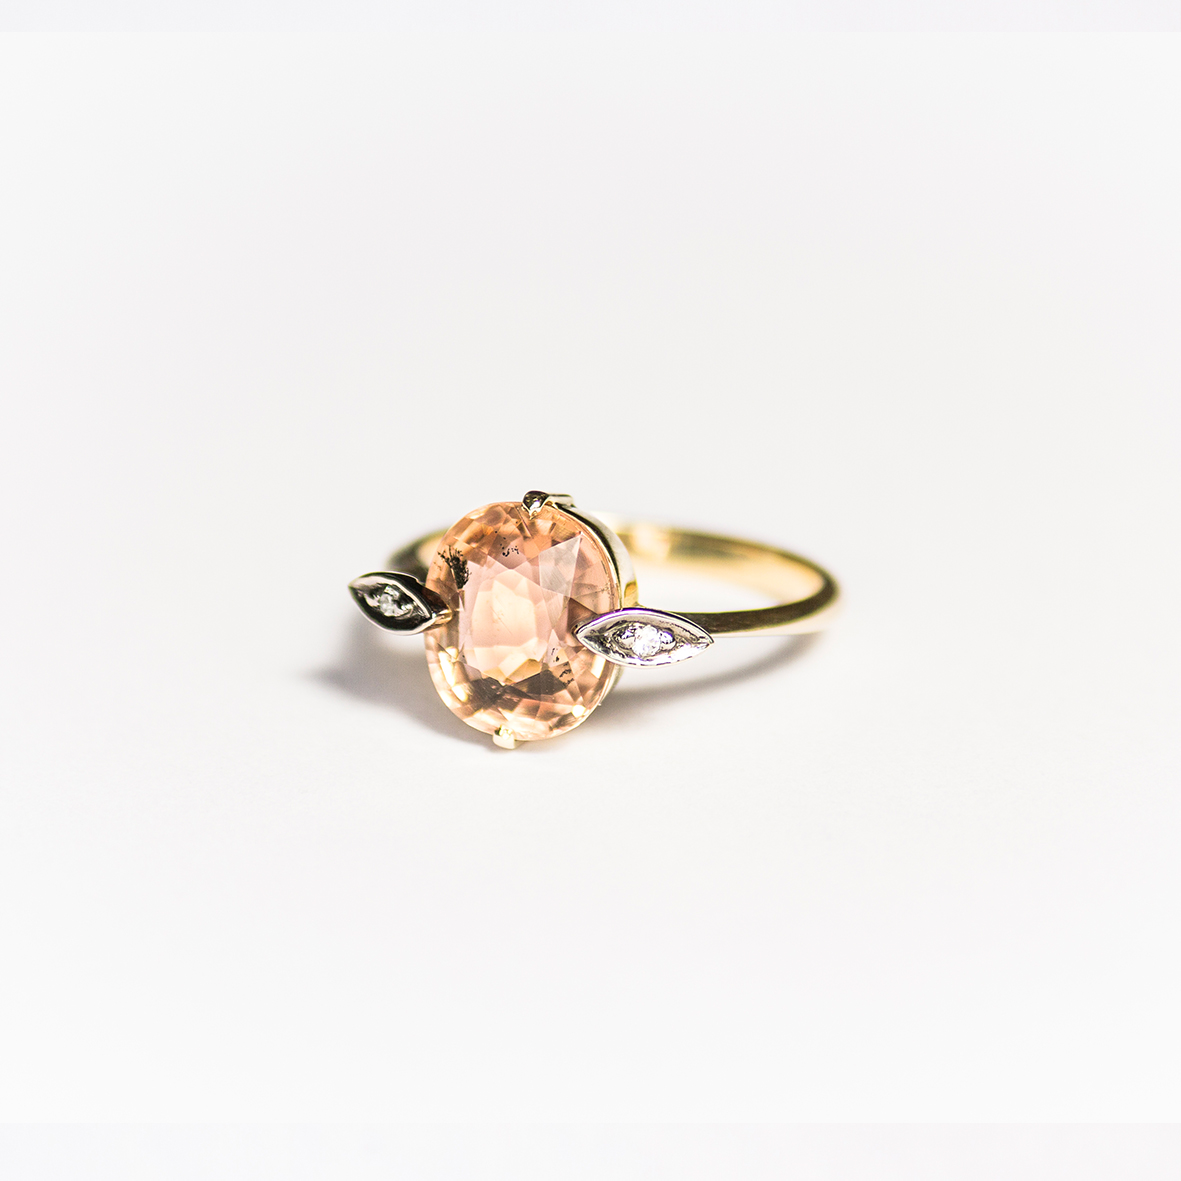 1. OONA_engagement_principal_peach tourmaline ring